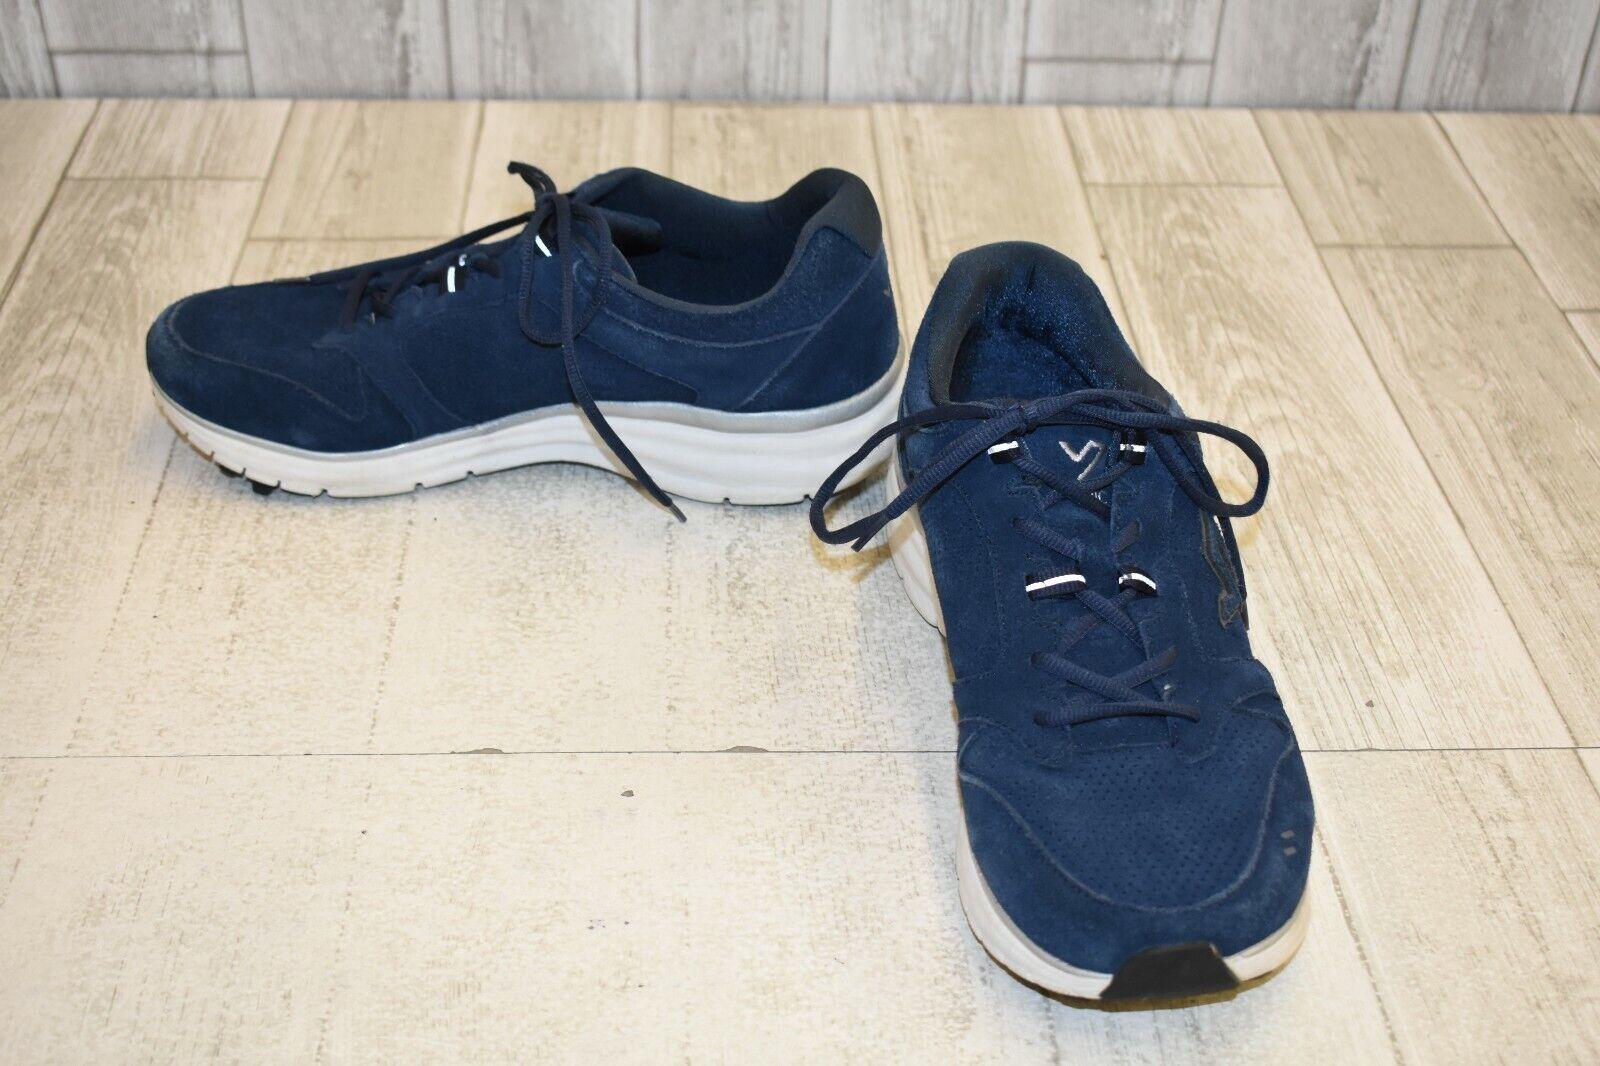 VIONIC Revive Active Sneaker - Men's Size 11.5 - Navy